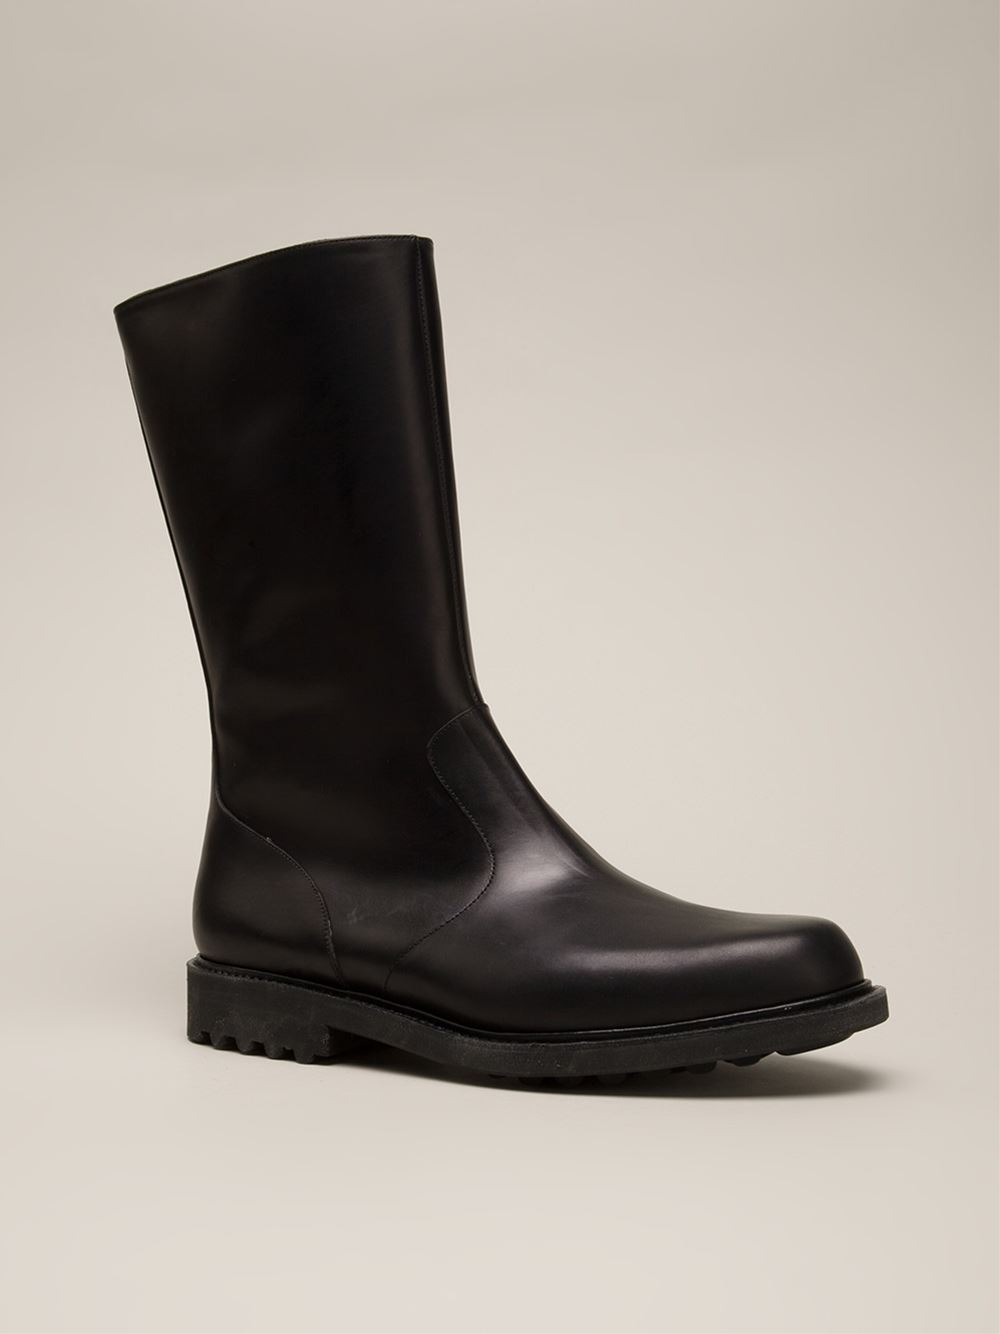 Robert Clergerie David Boots In Black For Men Lyst